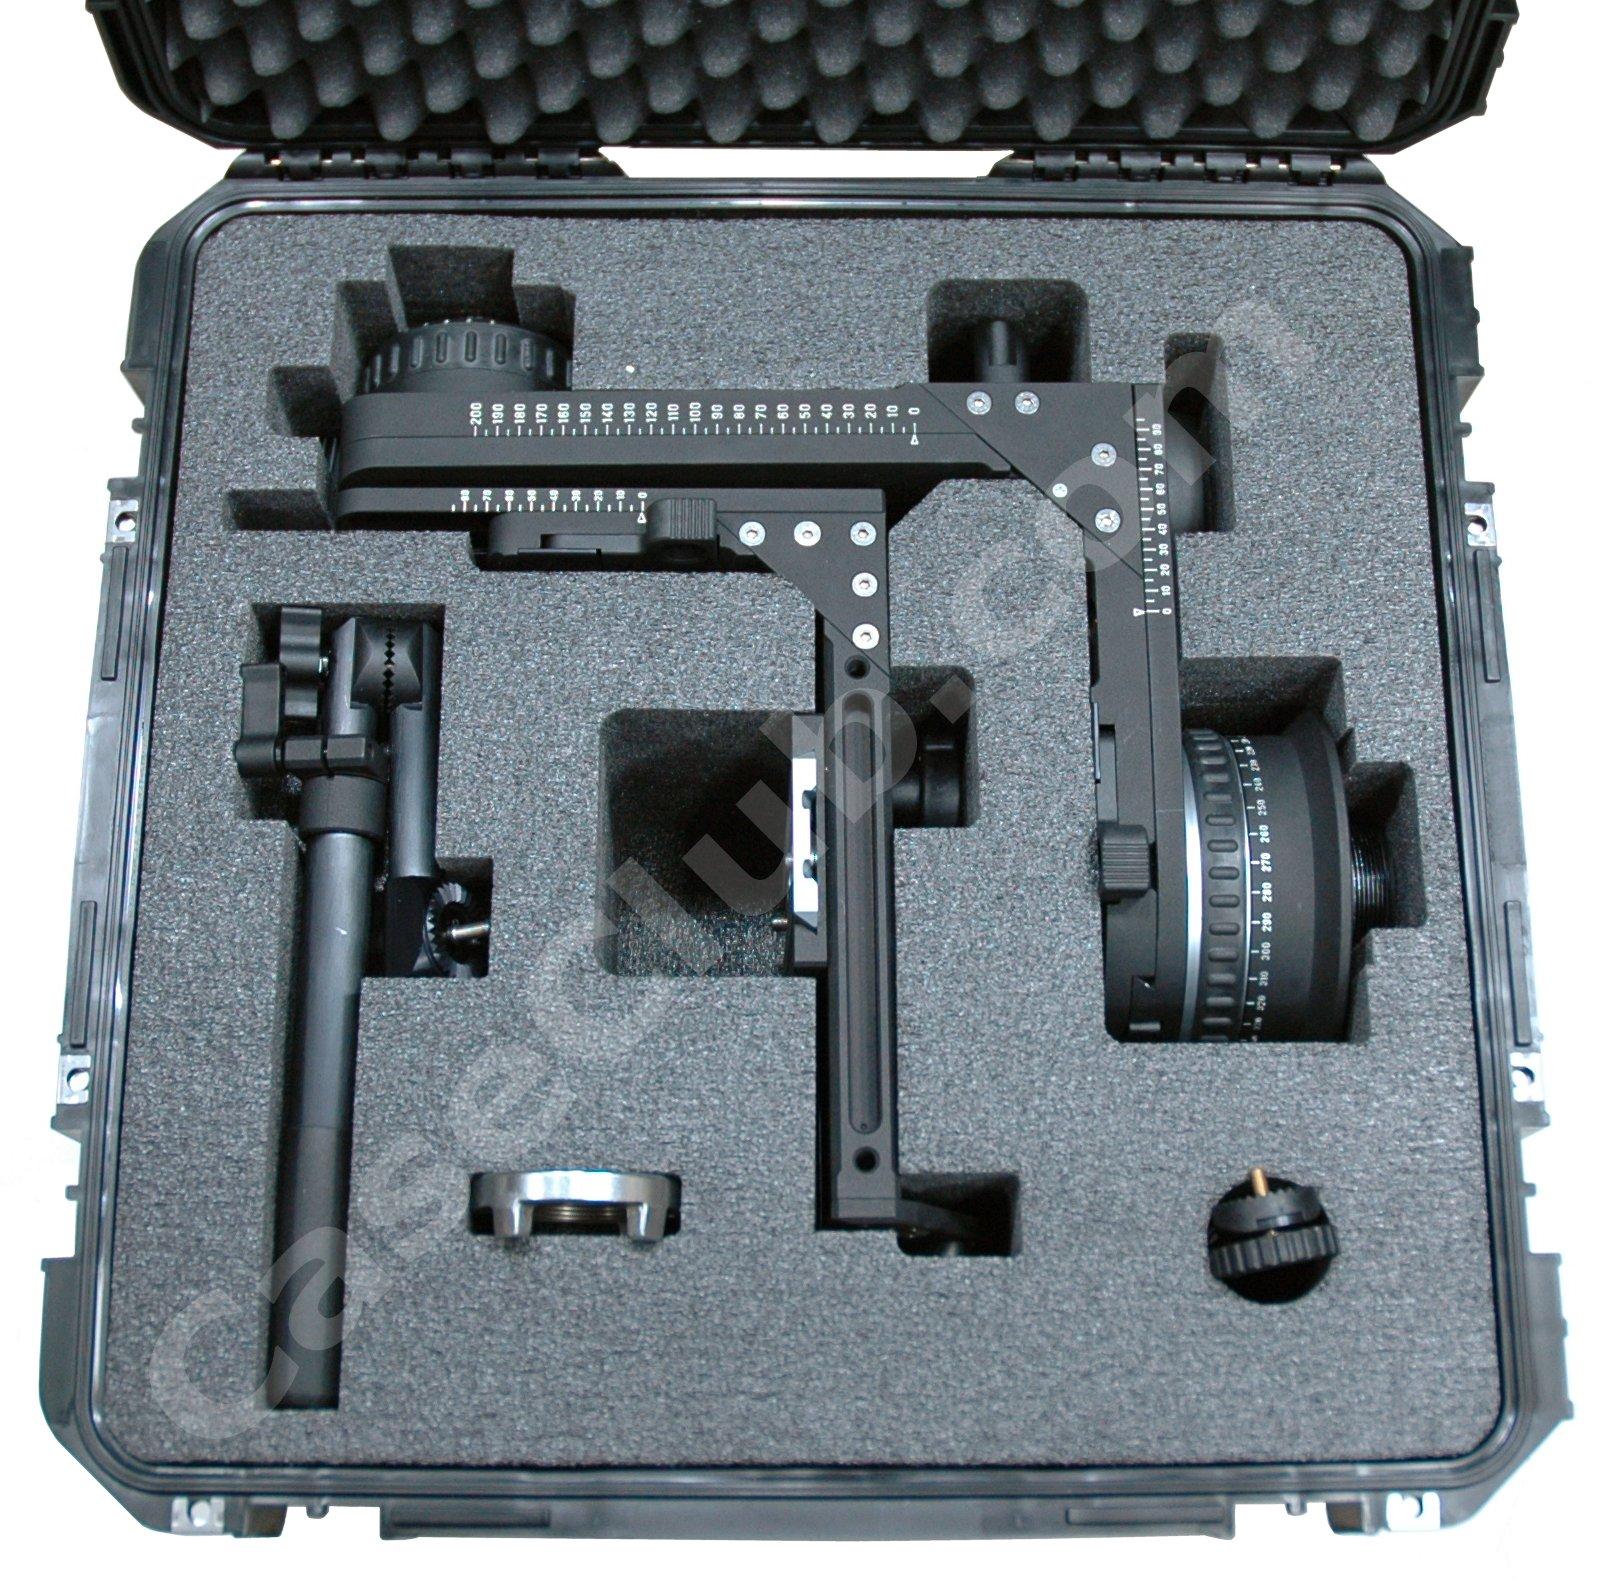 Cartoni Lambda Case - Foam Example for: SKB 3I-2222-12 Case